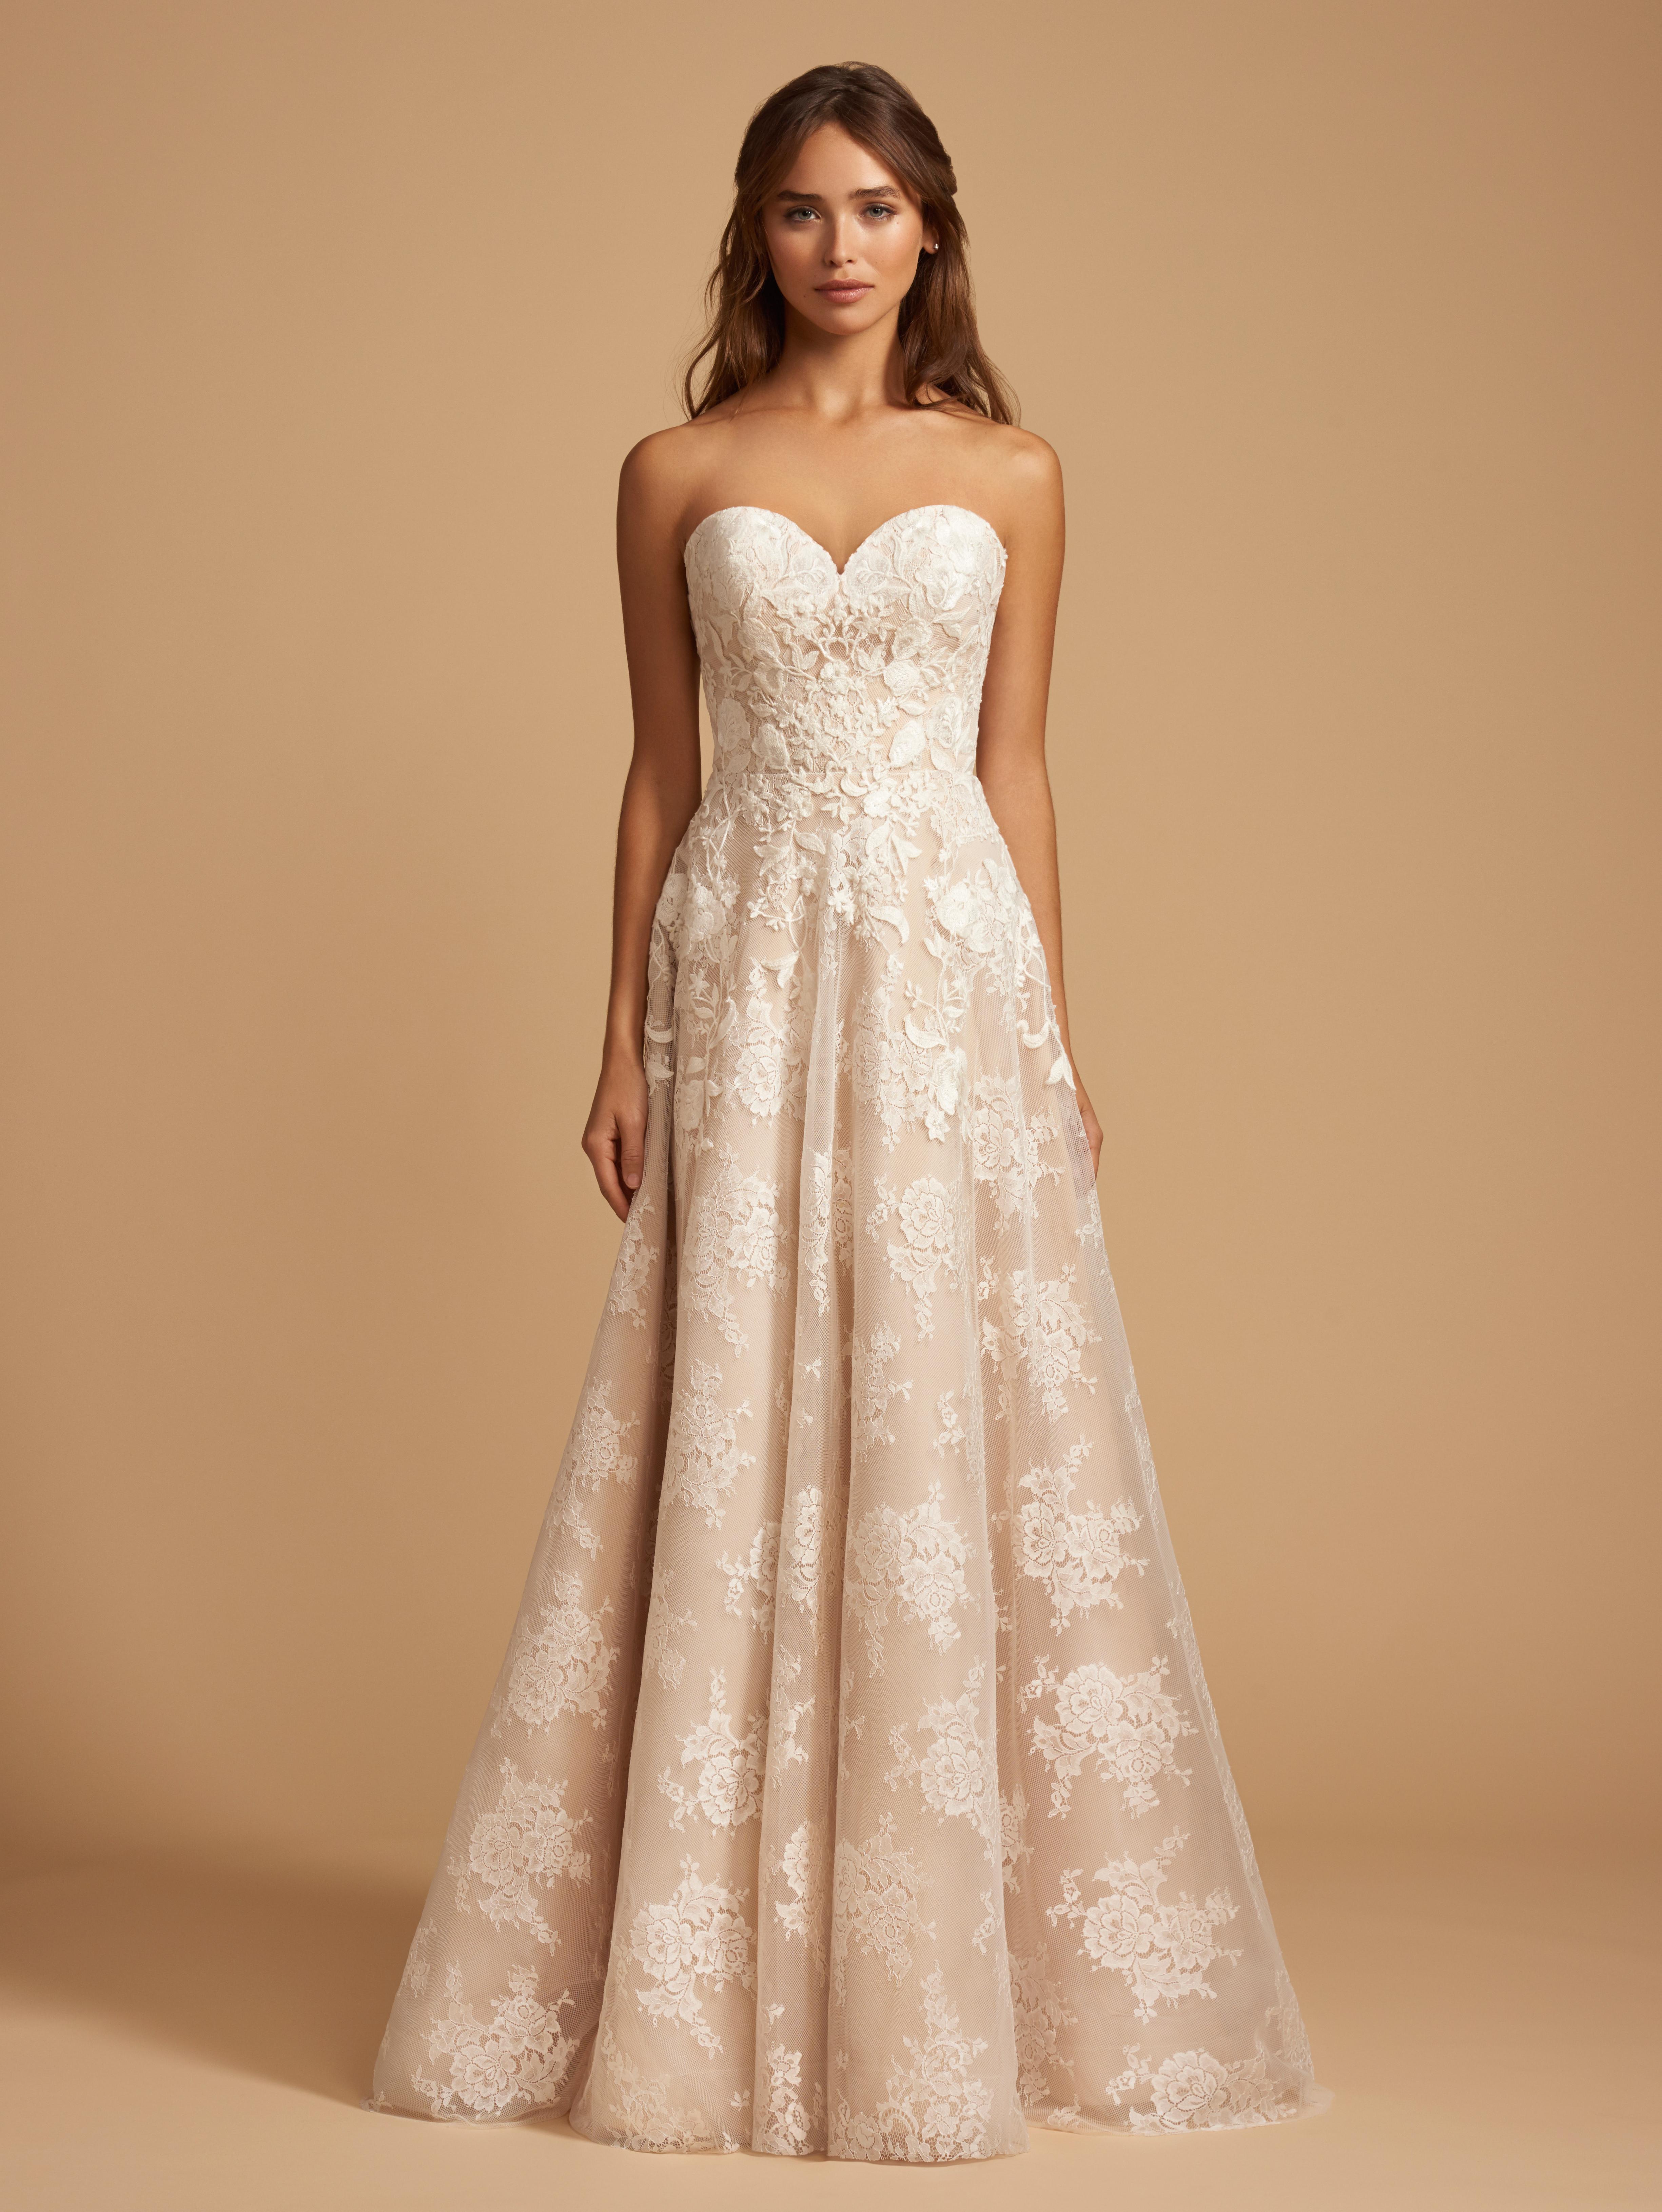 ti adora bridal phillipa wedding dresses Wedding Dress wedding dresses bridal shop store gowns christchurch wellington